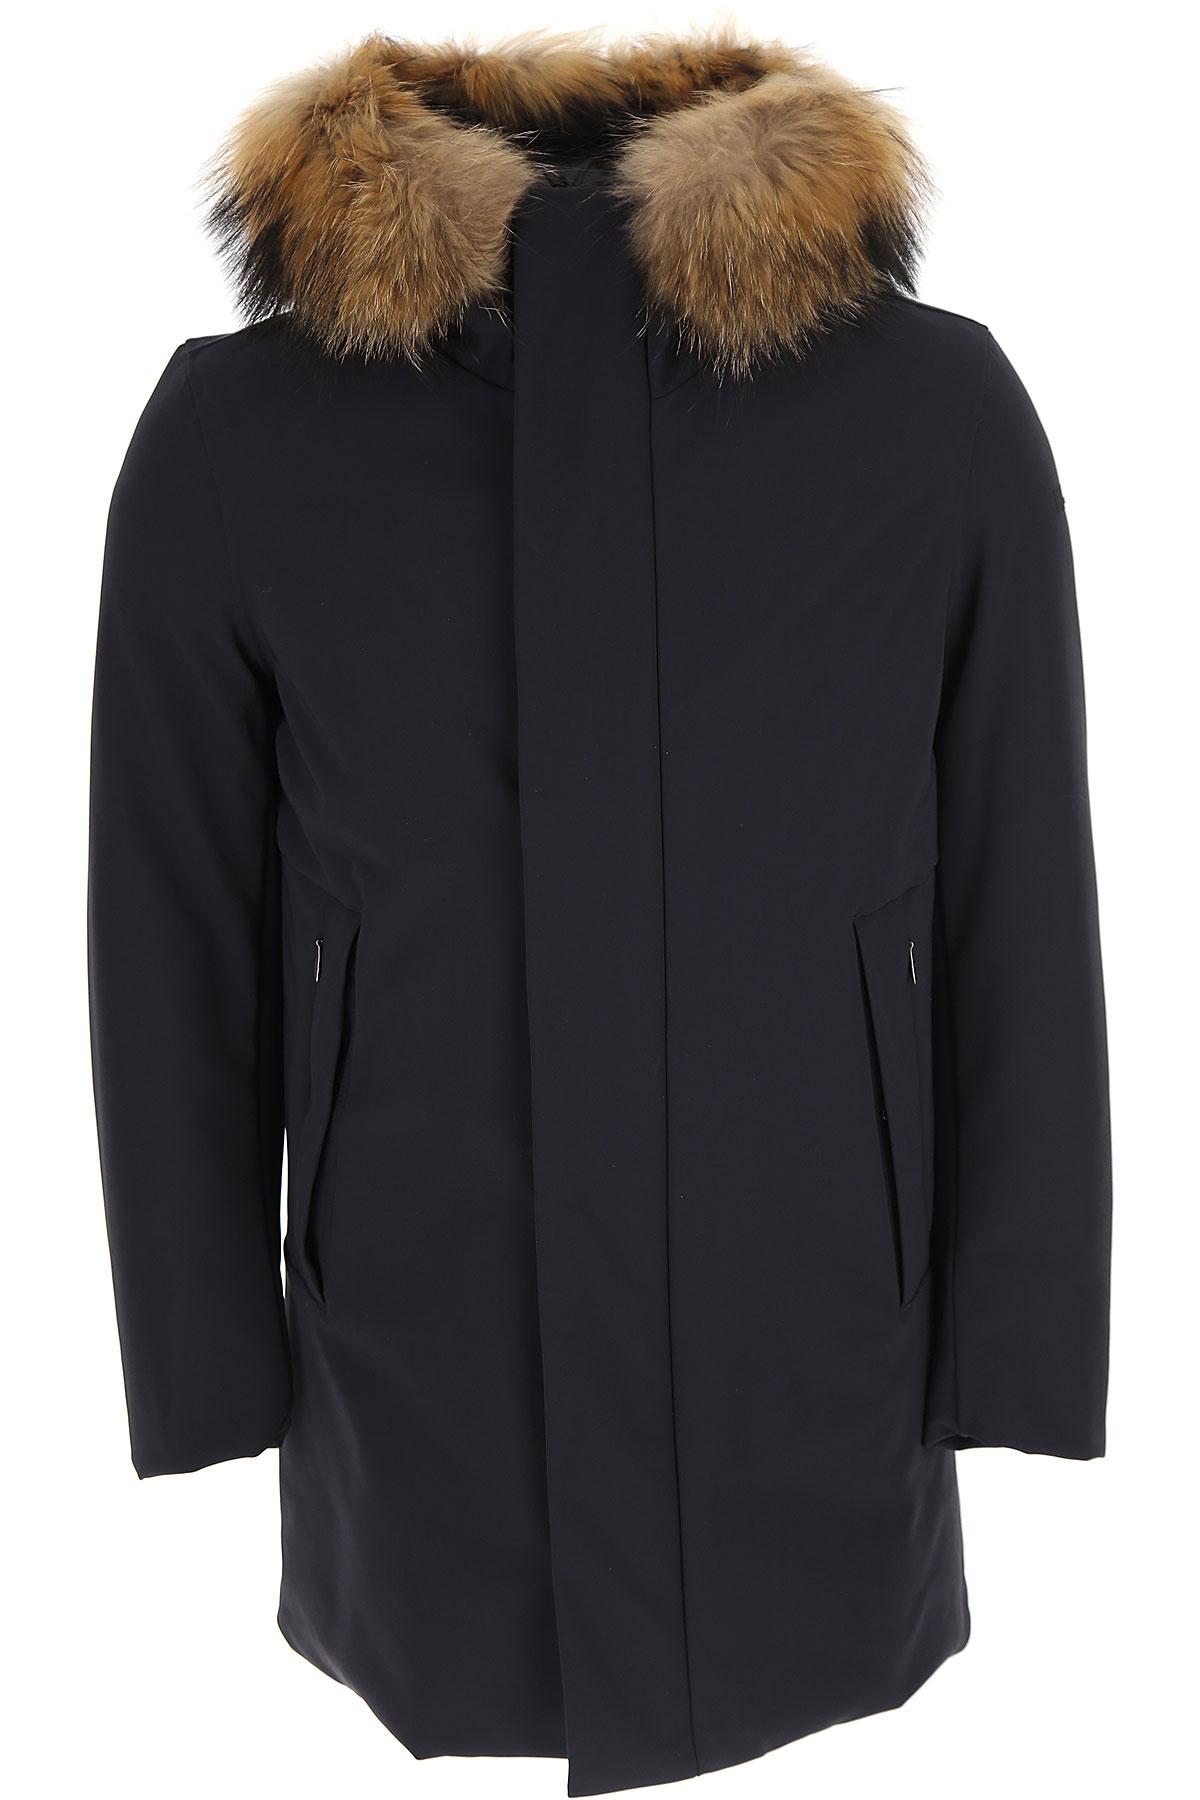 Image of RRD Down Jacket for Men, Puffer Ski Jacket, Ink Blue, Down, 2017, L M XL XXL